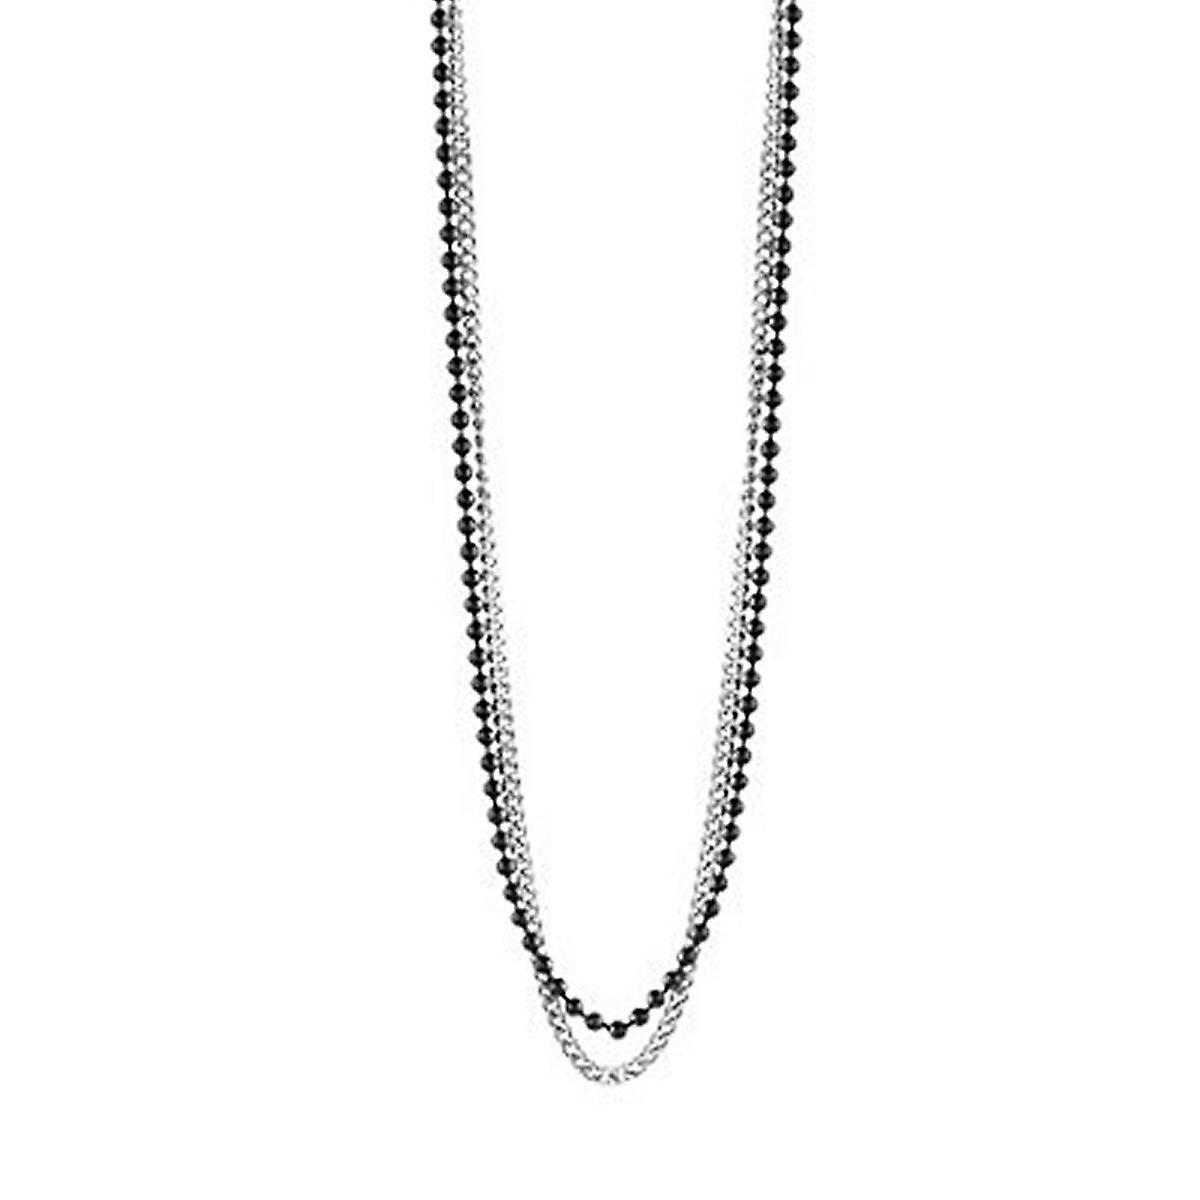 83e746248bfb Cadena collar de acero inoxidable GUESS hombre plata negro UMN21510 ...